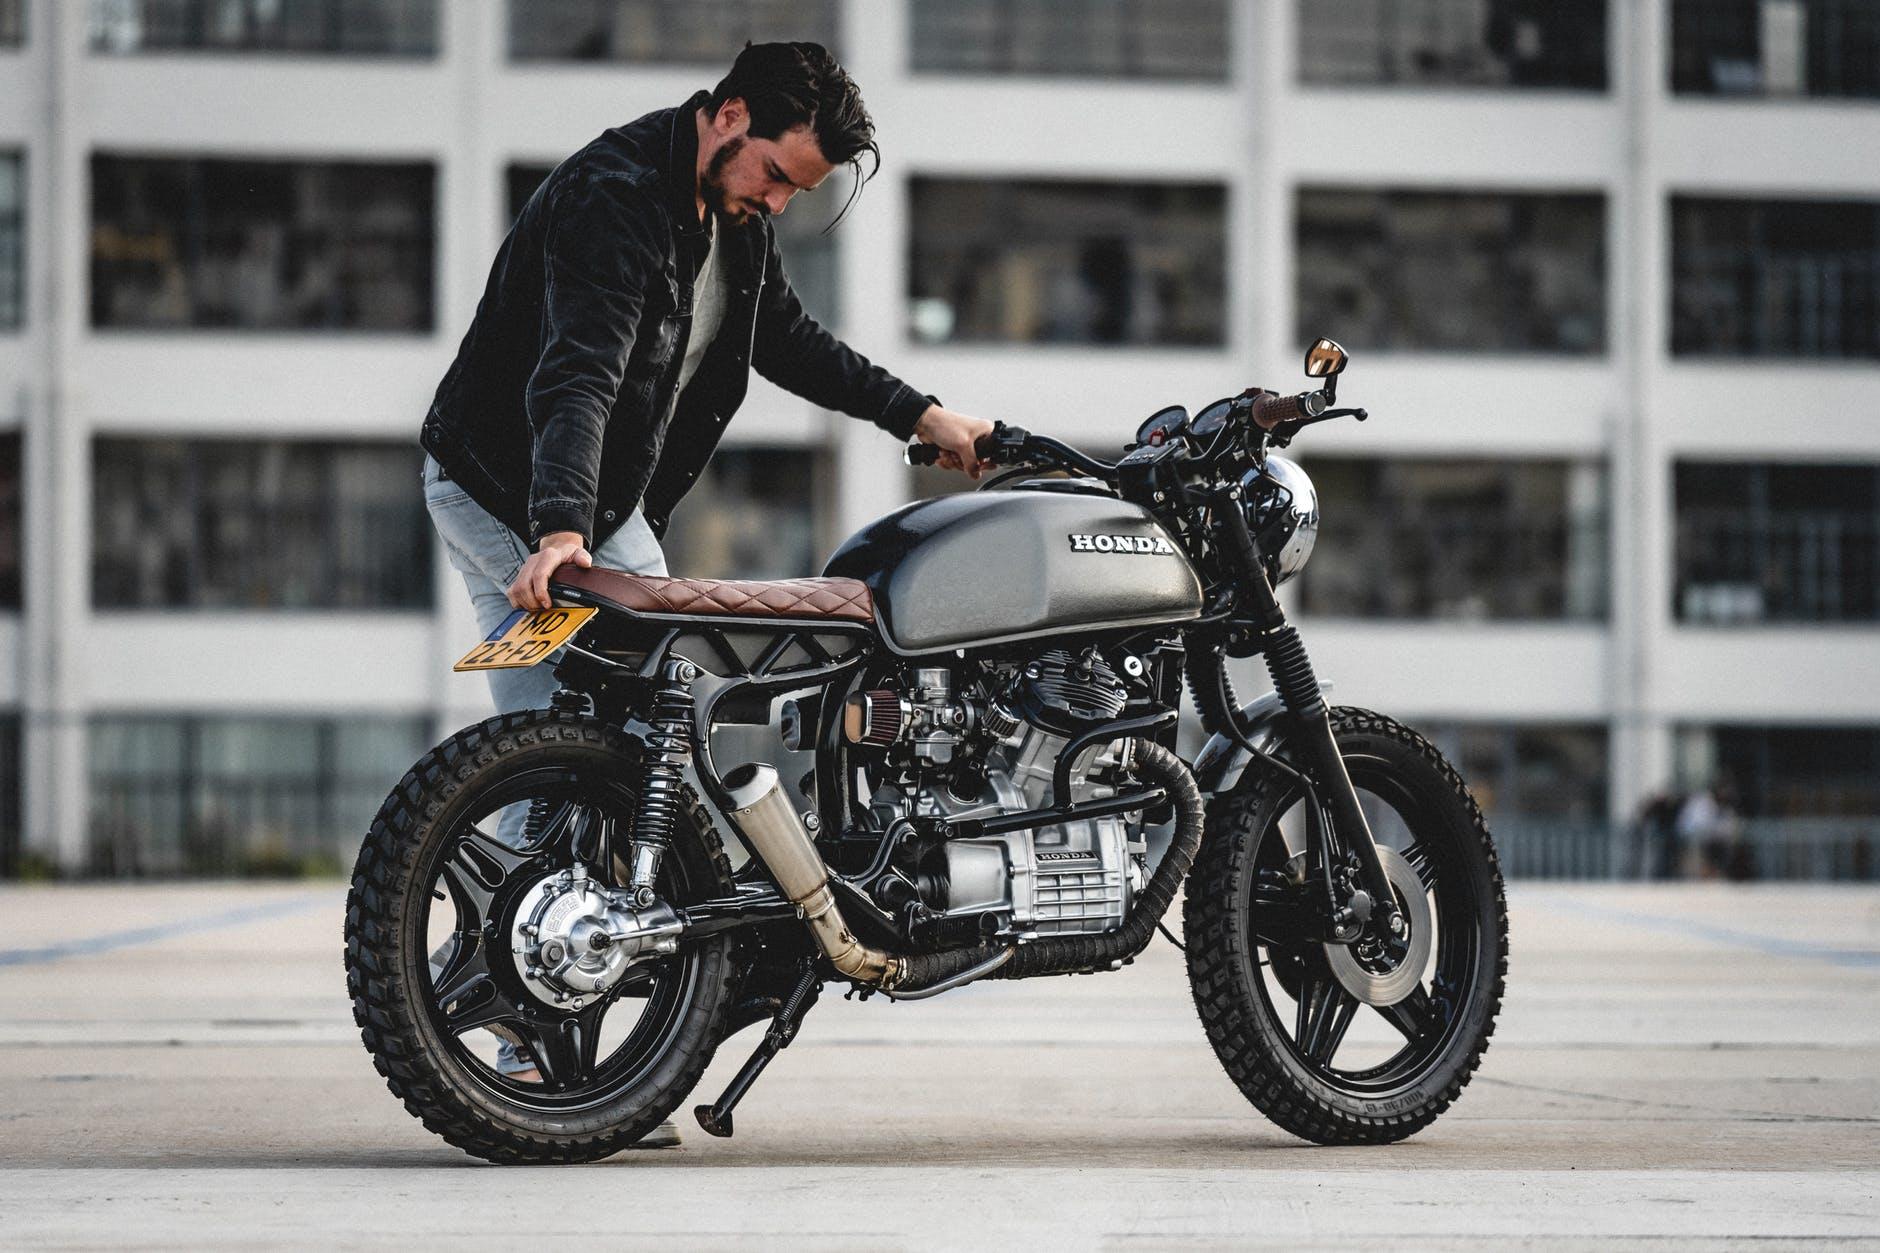 Top 10 Cafe Racer Bikes Of 2019 Ii Motorbikes India